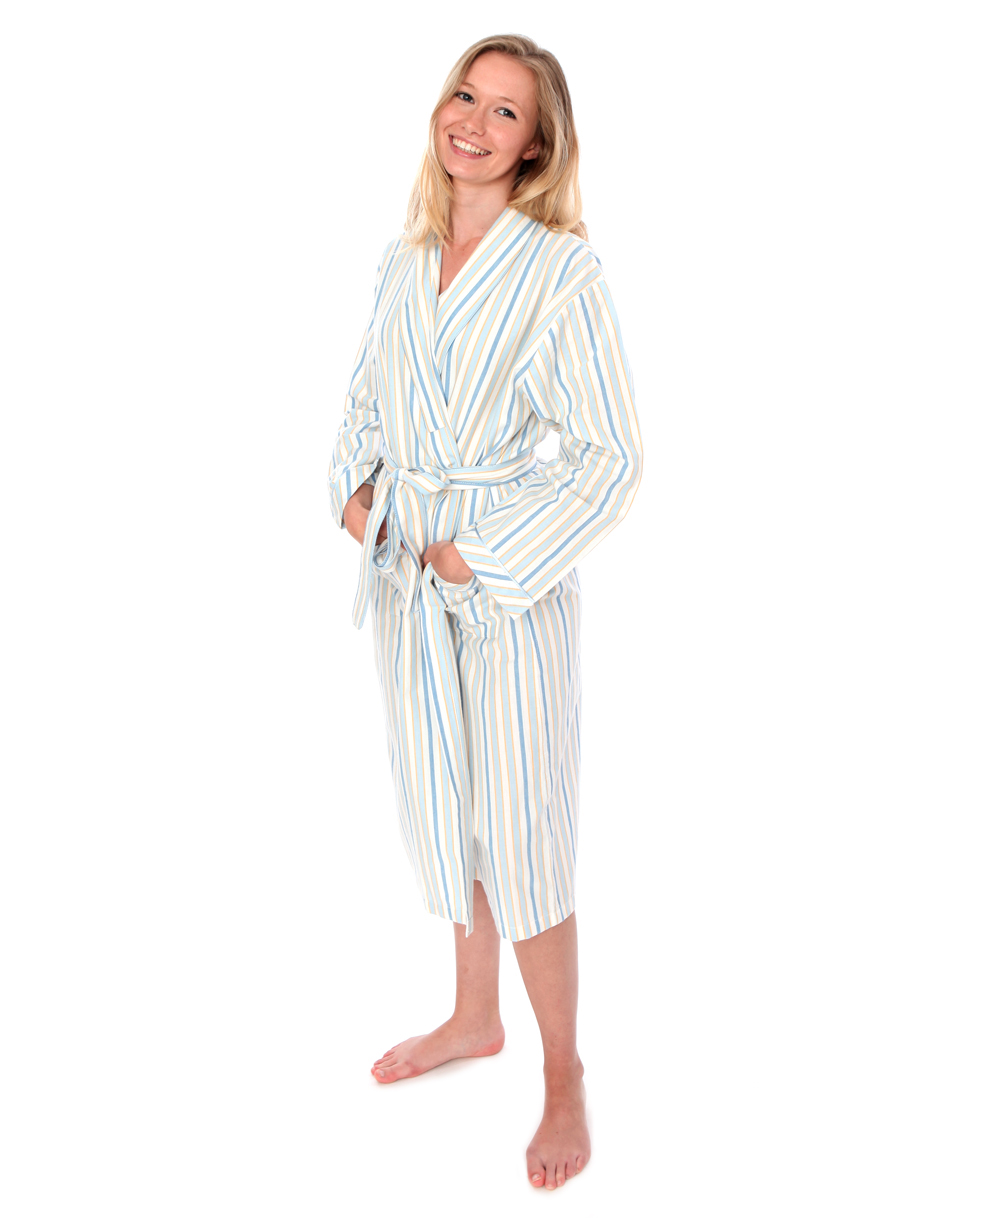 Blue Sky Striped Dressing Gown - The Pyjama Store